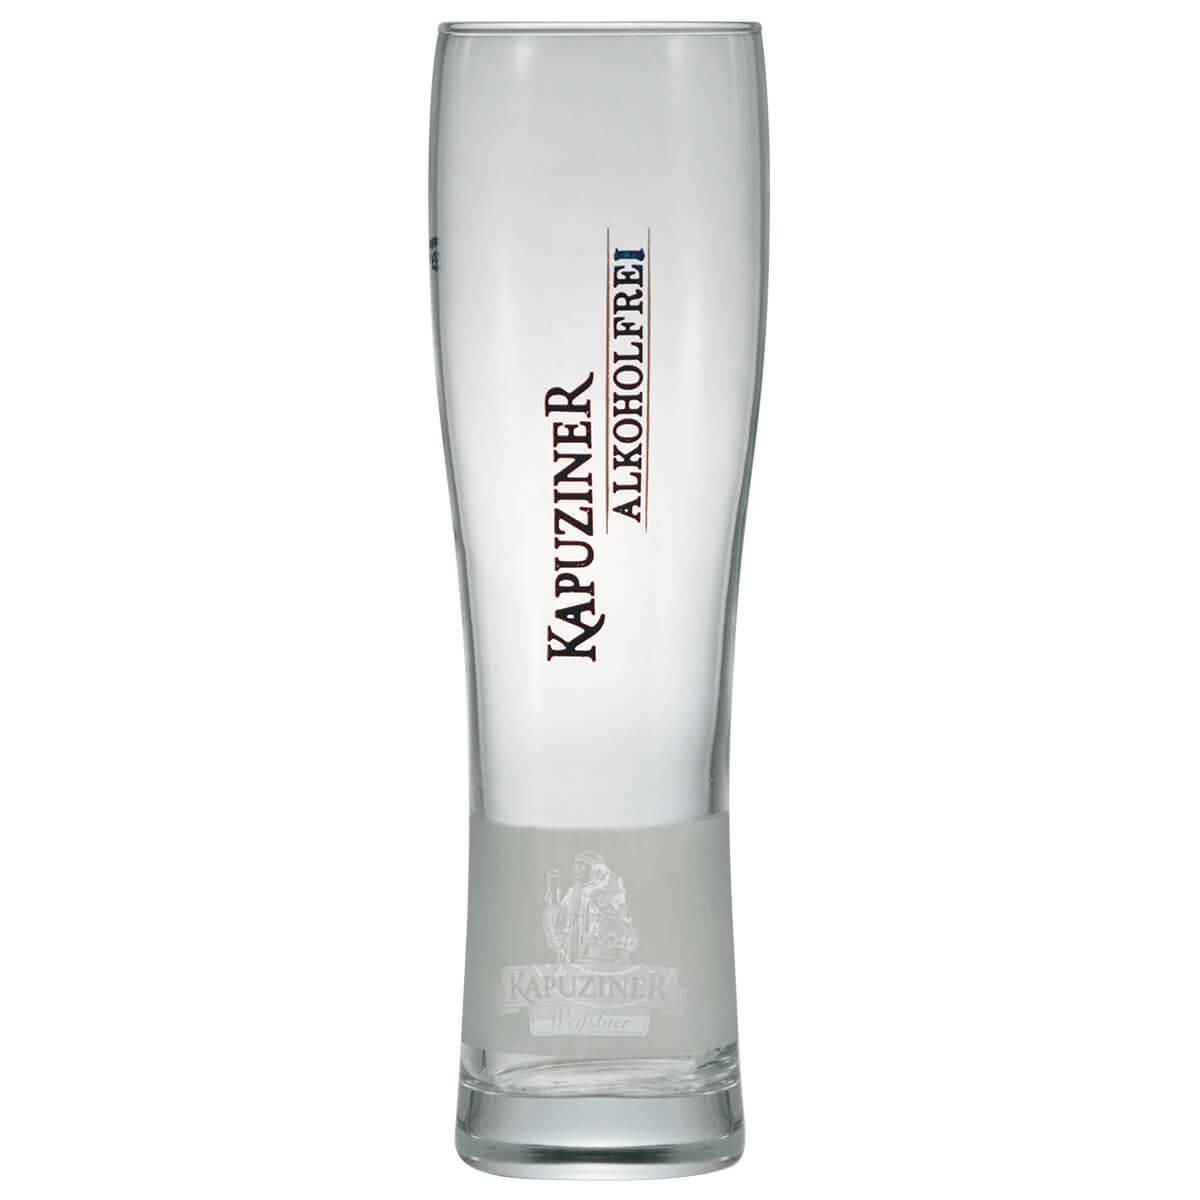 Copo de Cerveja Vidro Kapuziner 600ml